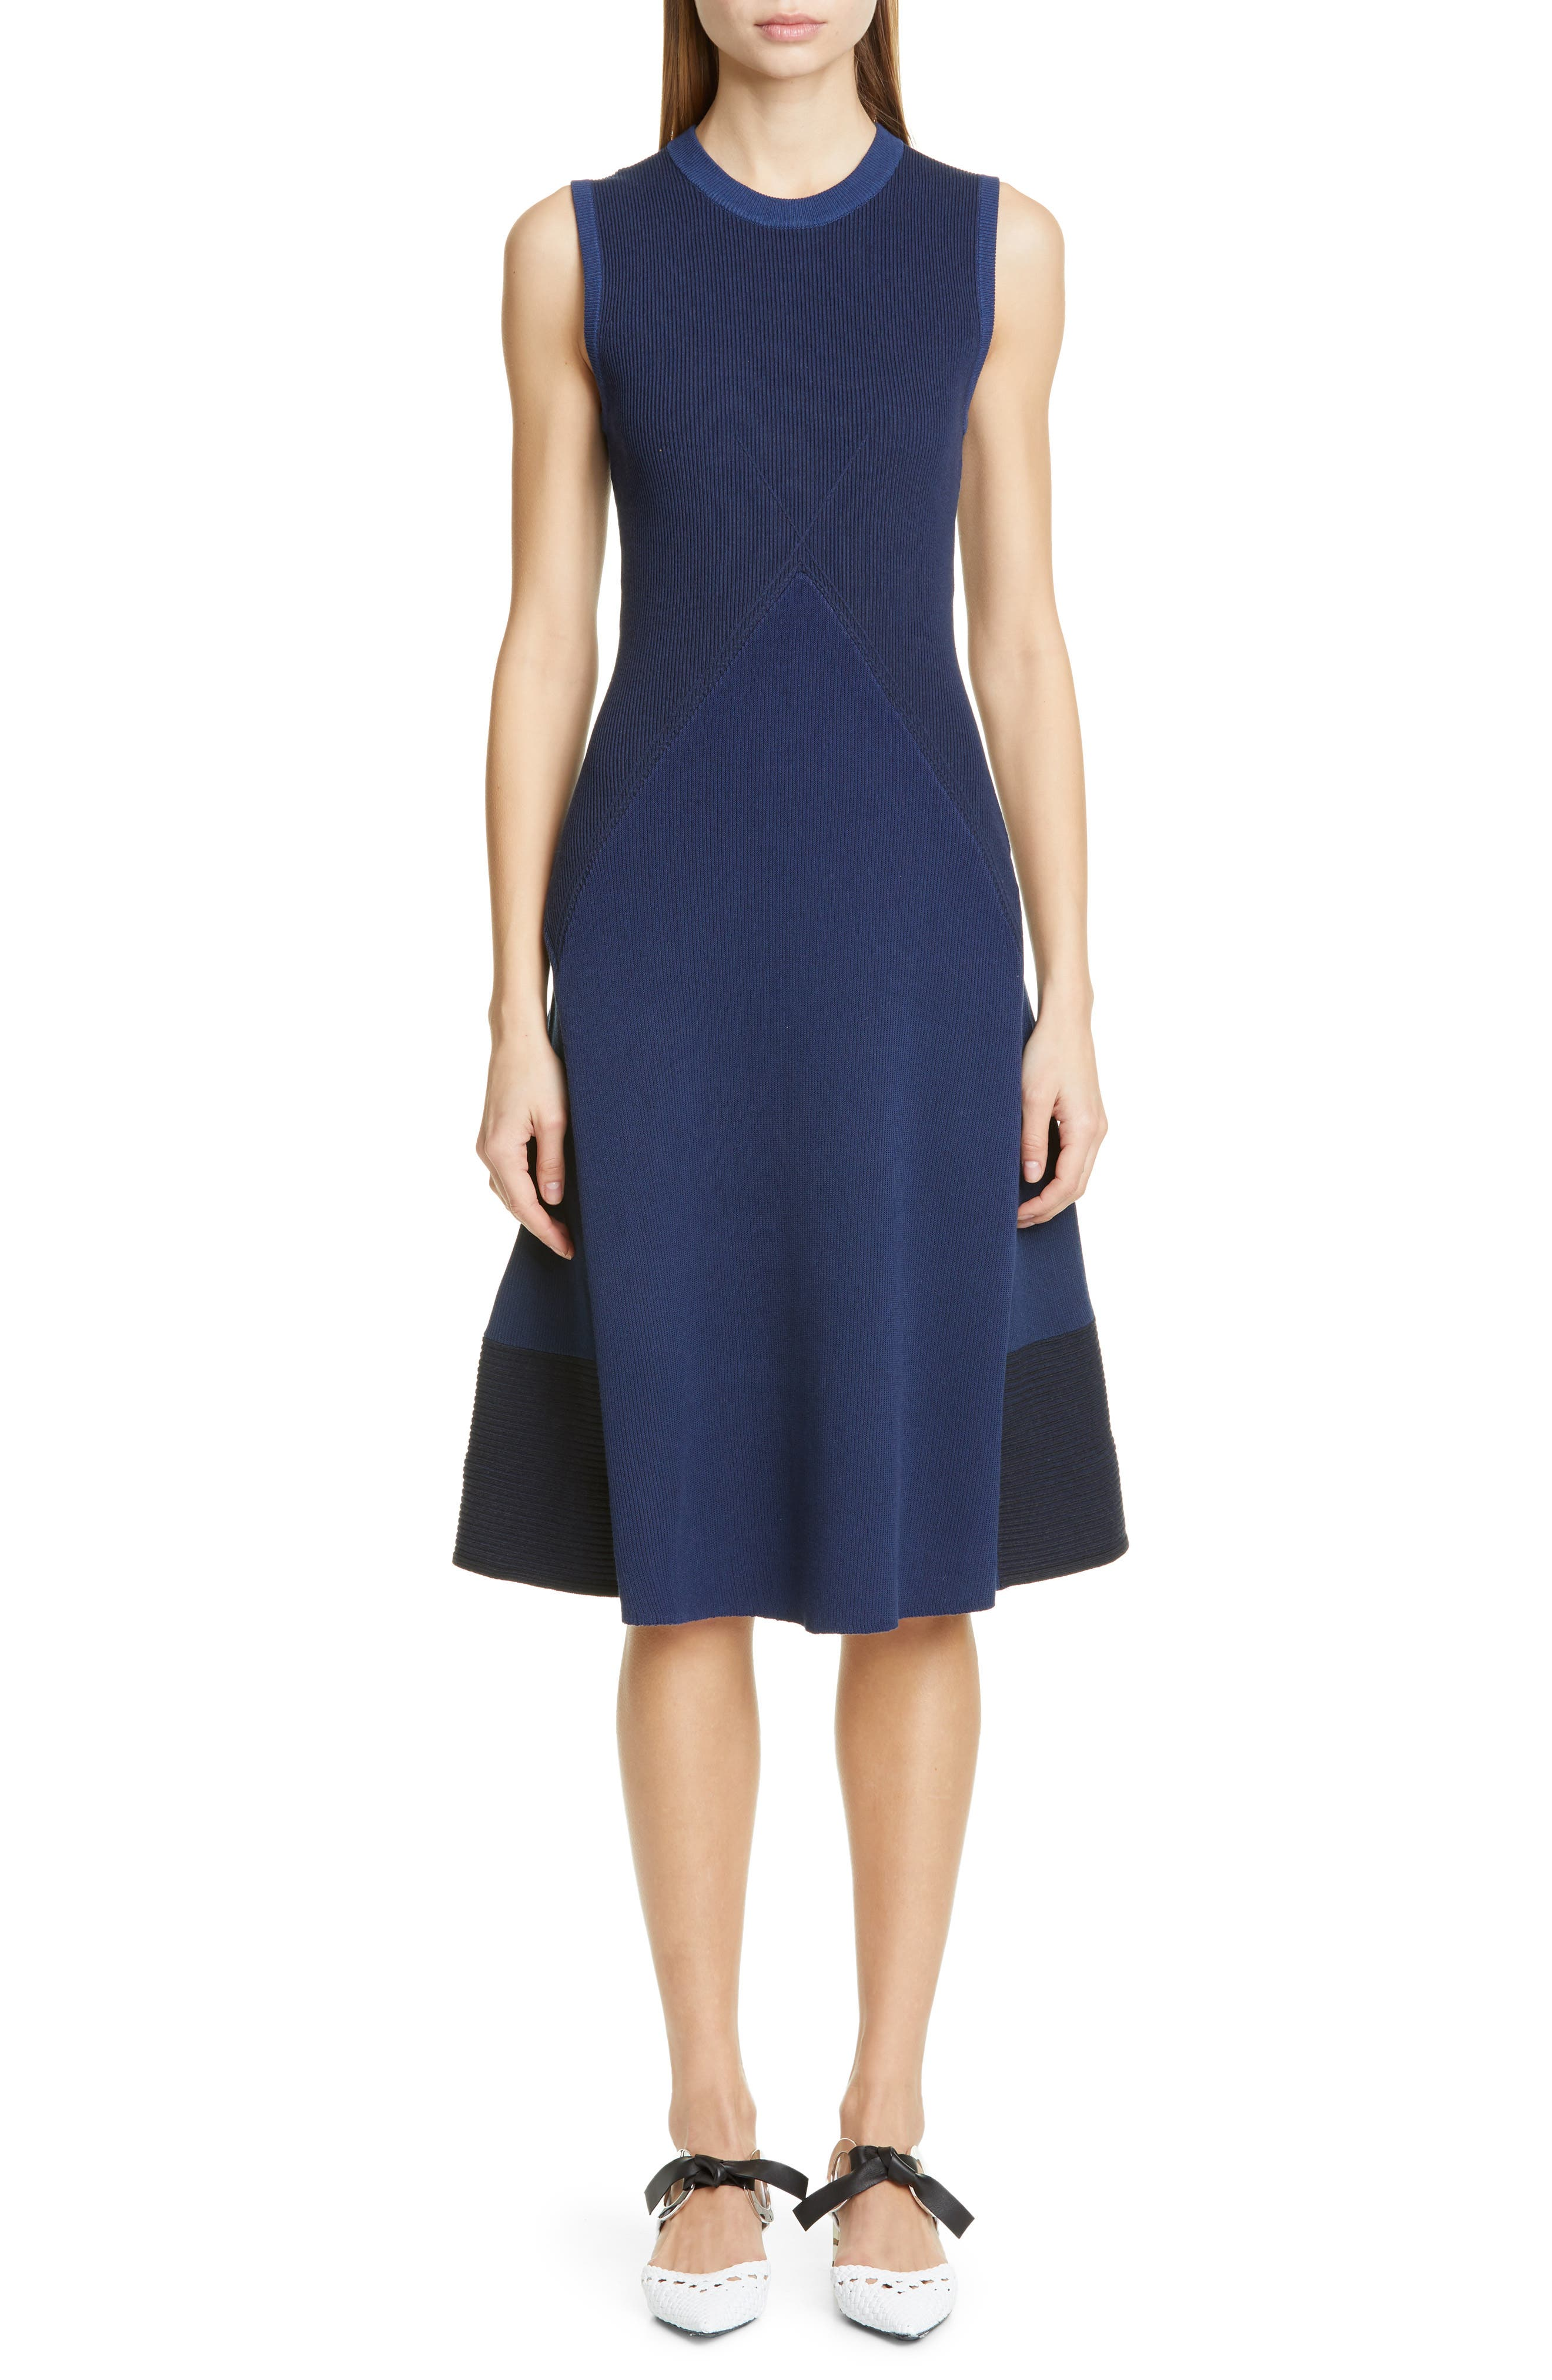 Proenza Schouler Mixed Stitch Colorblock Sweater Dress, Blue